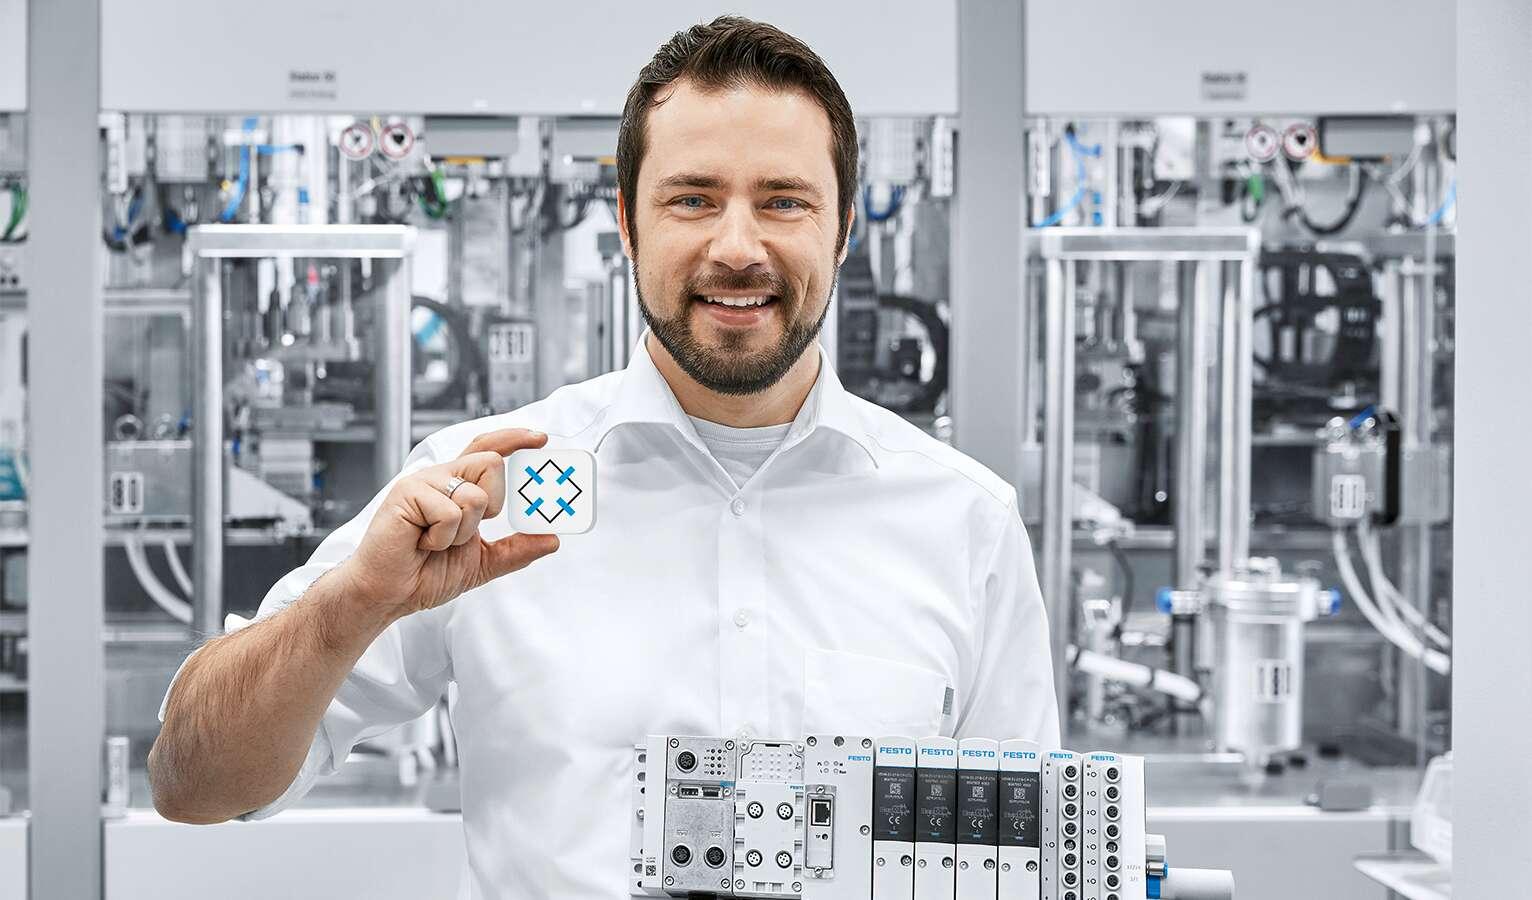 Engineering careers at Festo | Festo Corporate